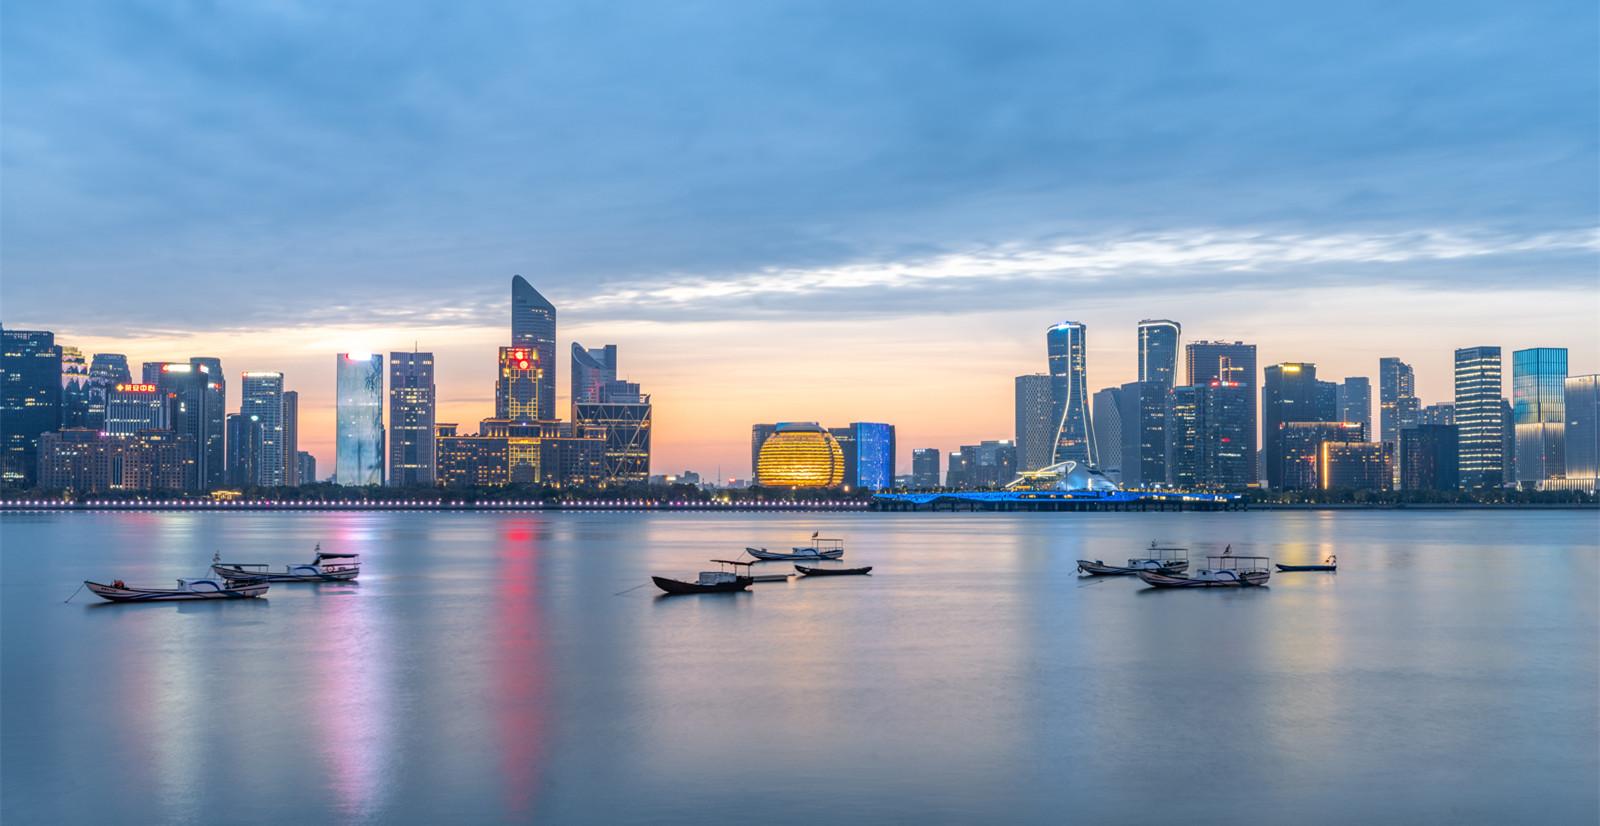 Smart city platform improves urban management in Hangzhou